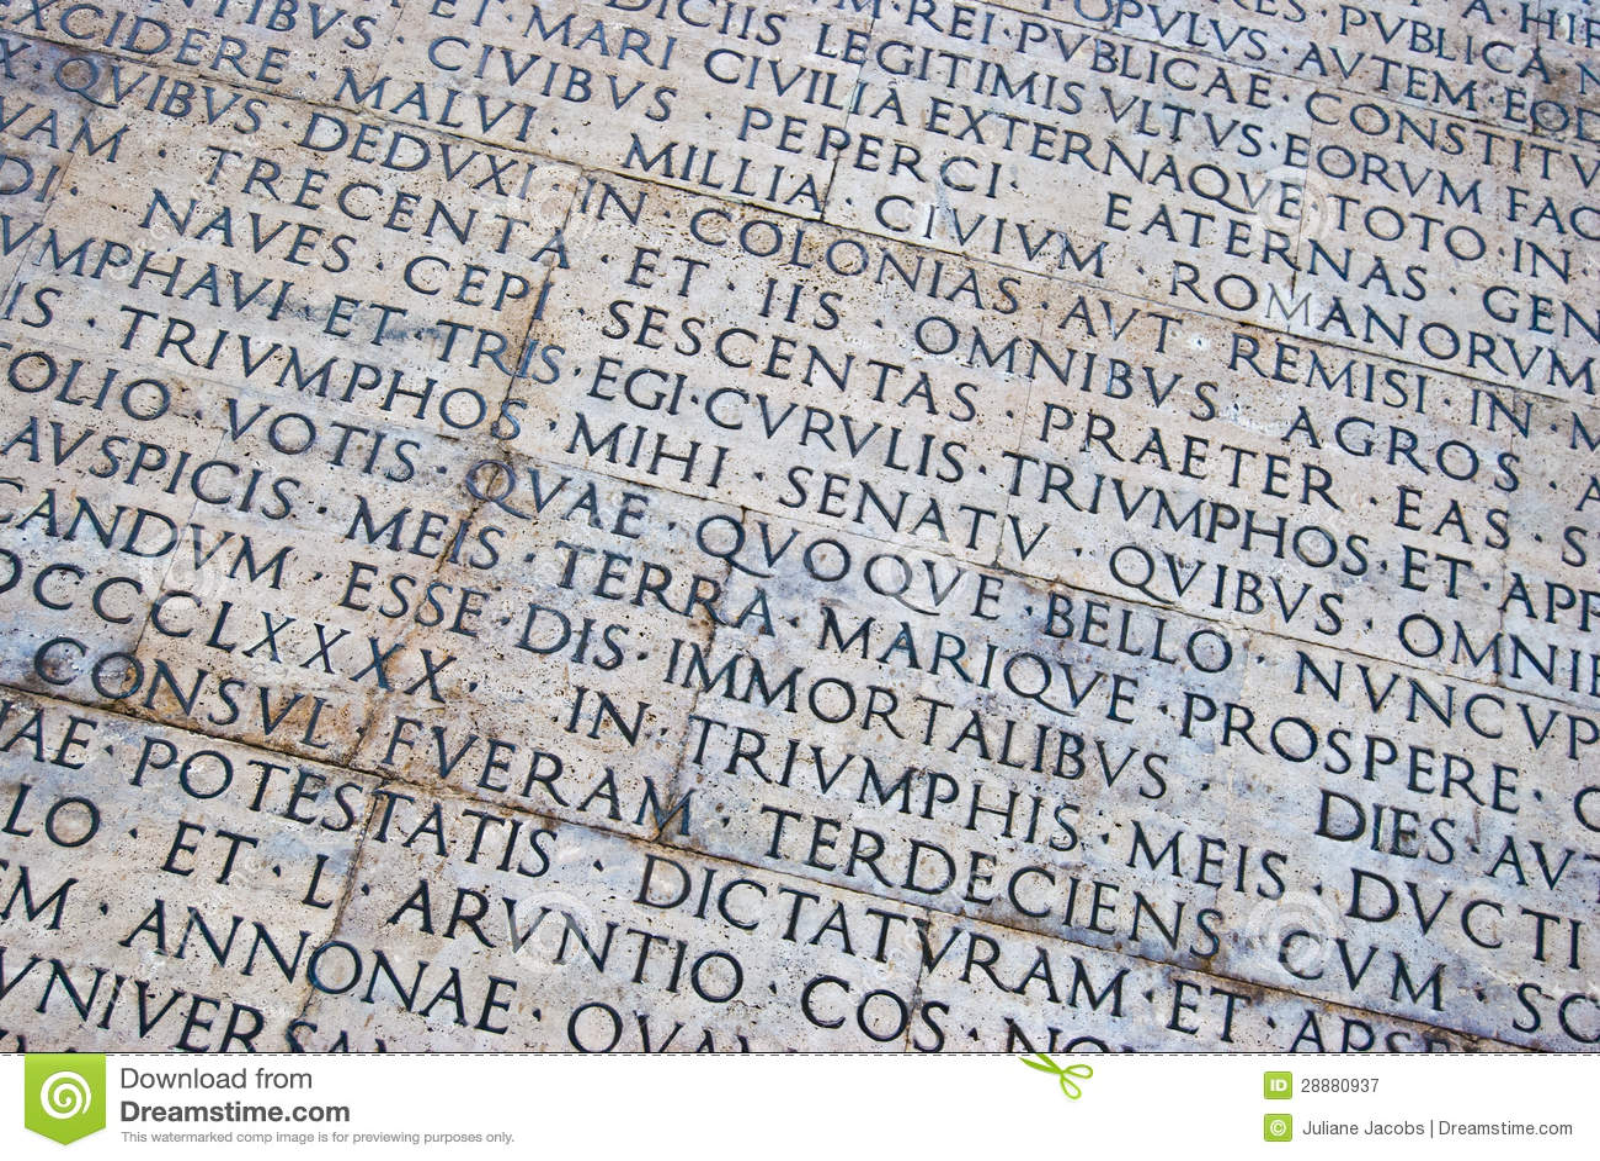 Romański święte pisma